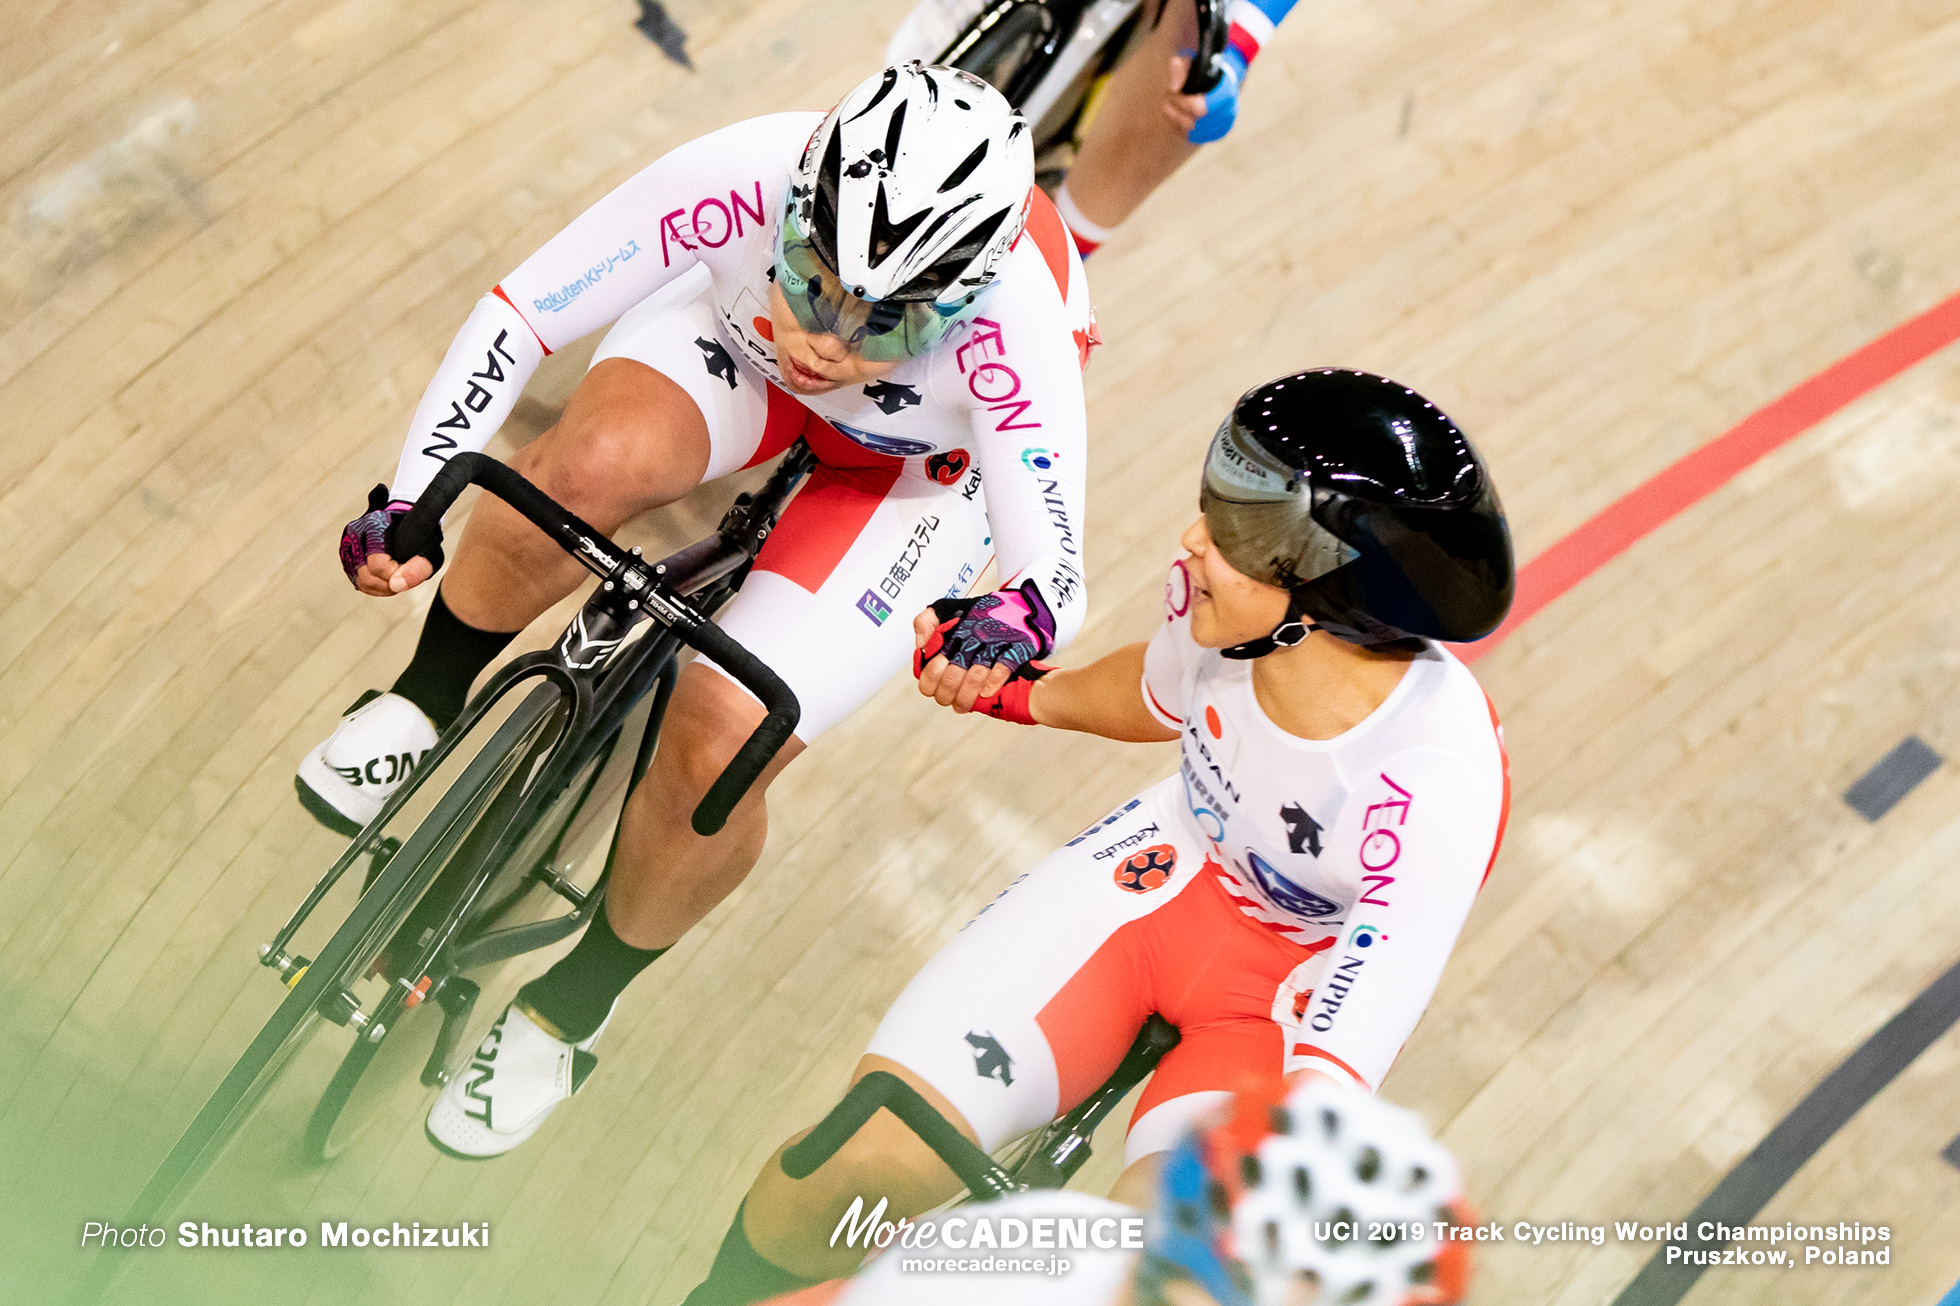 Women's Madison / 2019 Track Cycling World Championships Pruszków, Poland